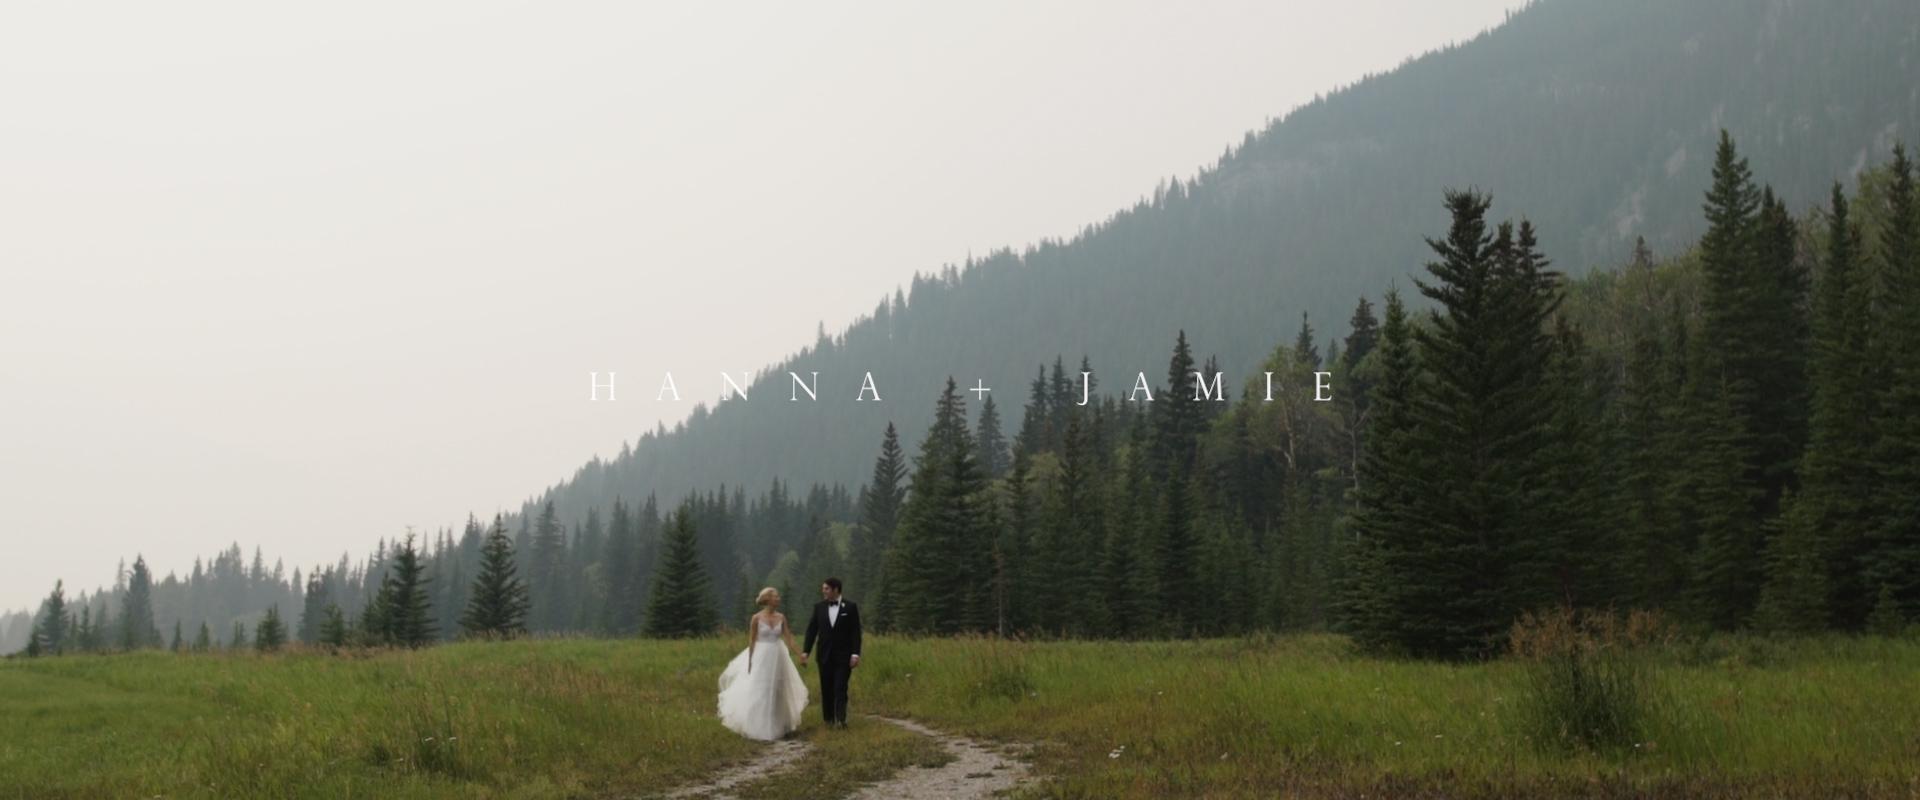 Hanna + Jamie | Banff, Canada | Fairmont Banff Springs